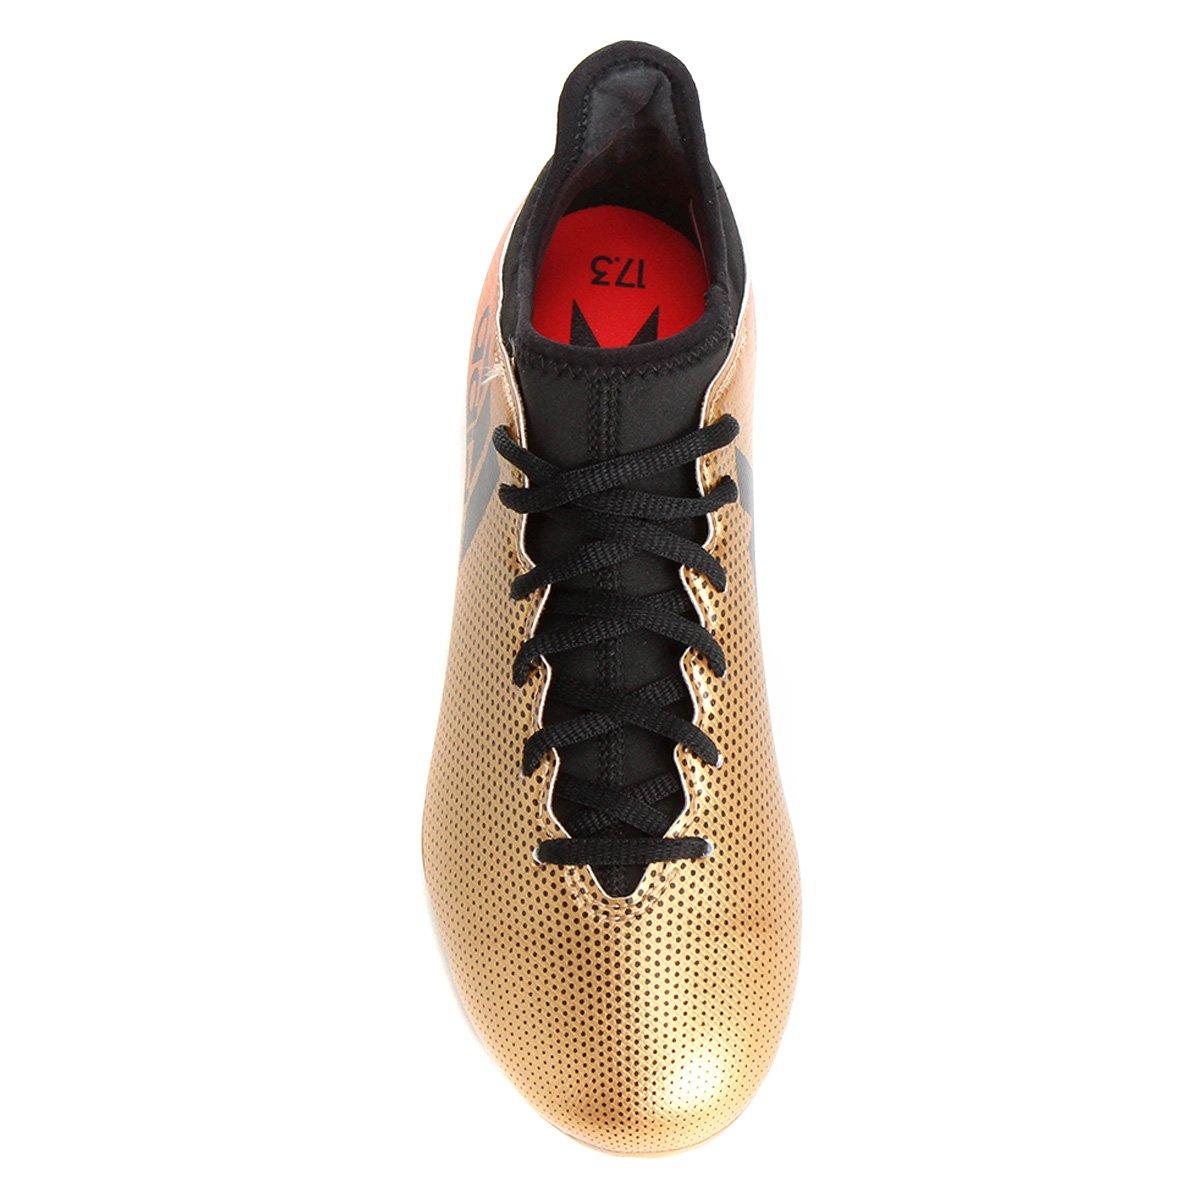 8fd1d1b534 Chuteira Campo Adidas X 17 3 FG - Dourado - Compre Agora